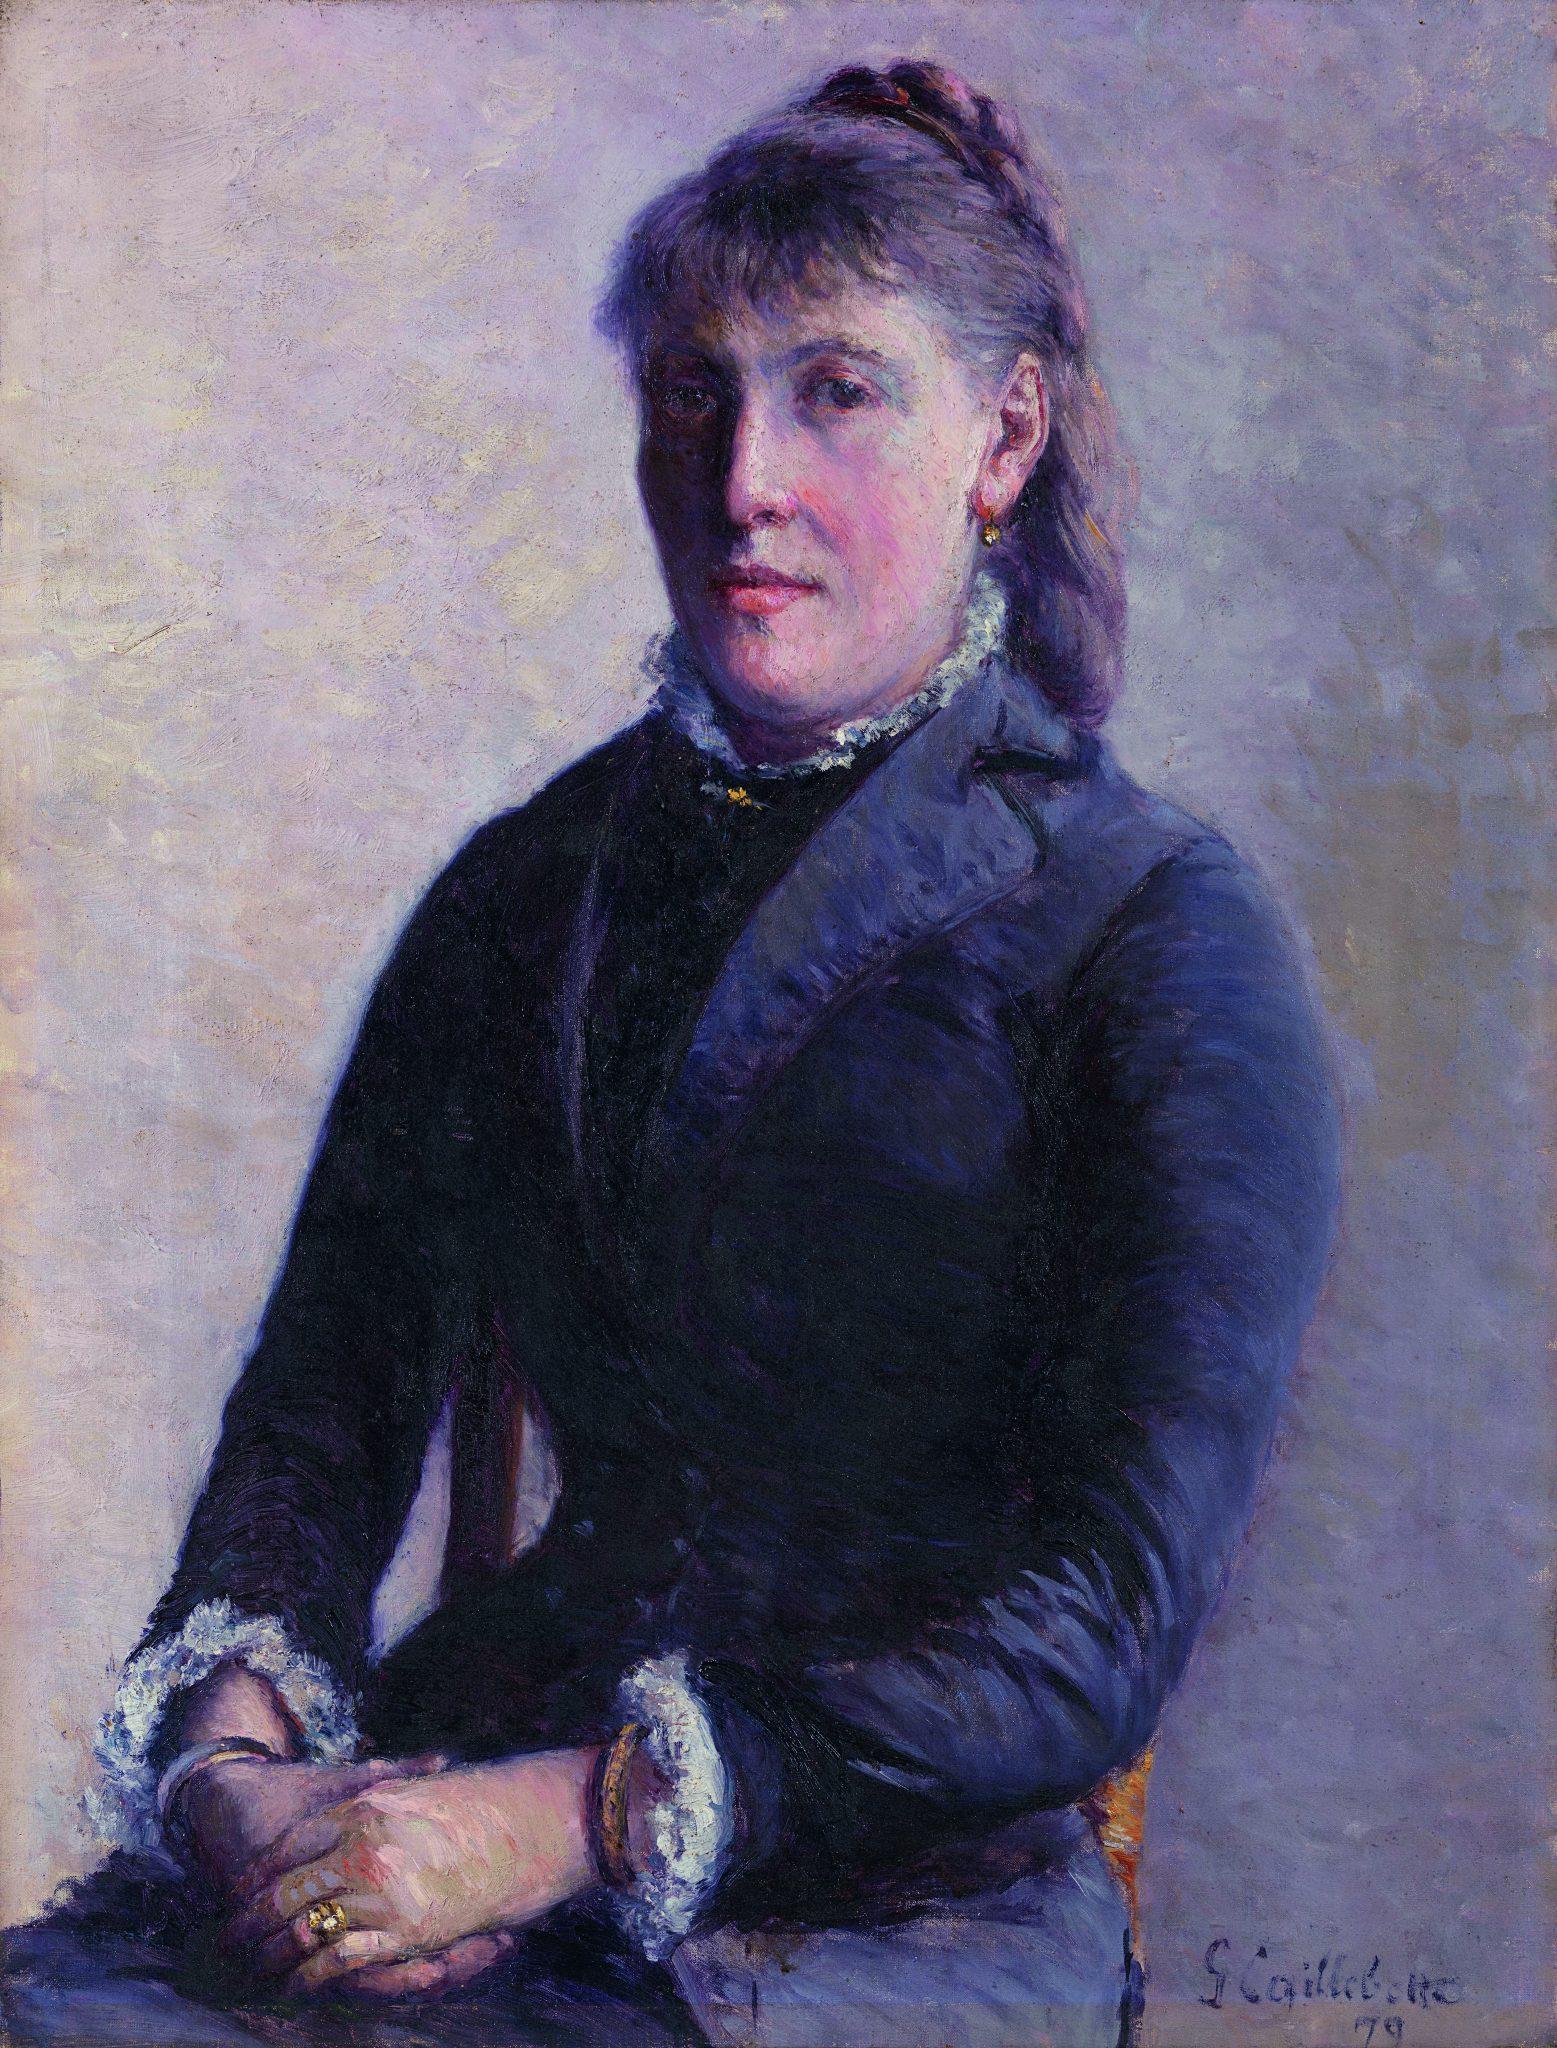 Caillebotte, Gustave ~ Portrait de Madame Anne-Marie Hagen